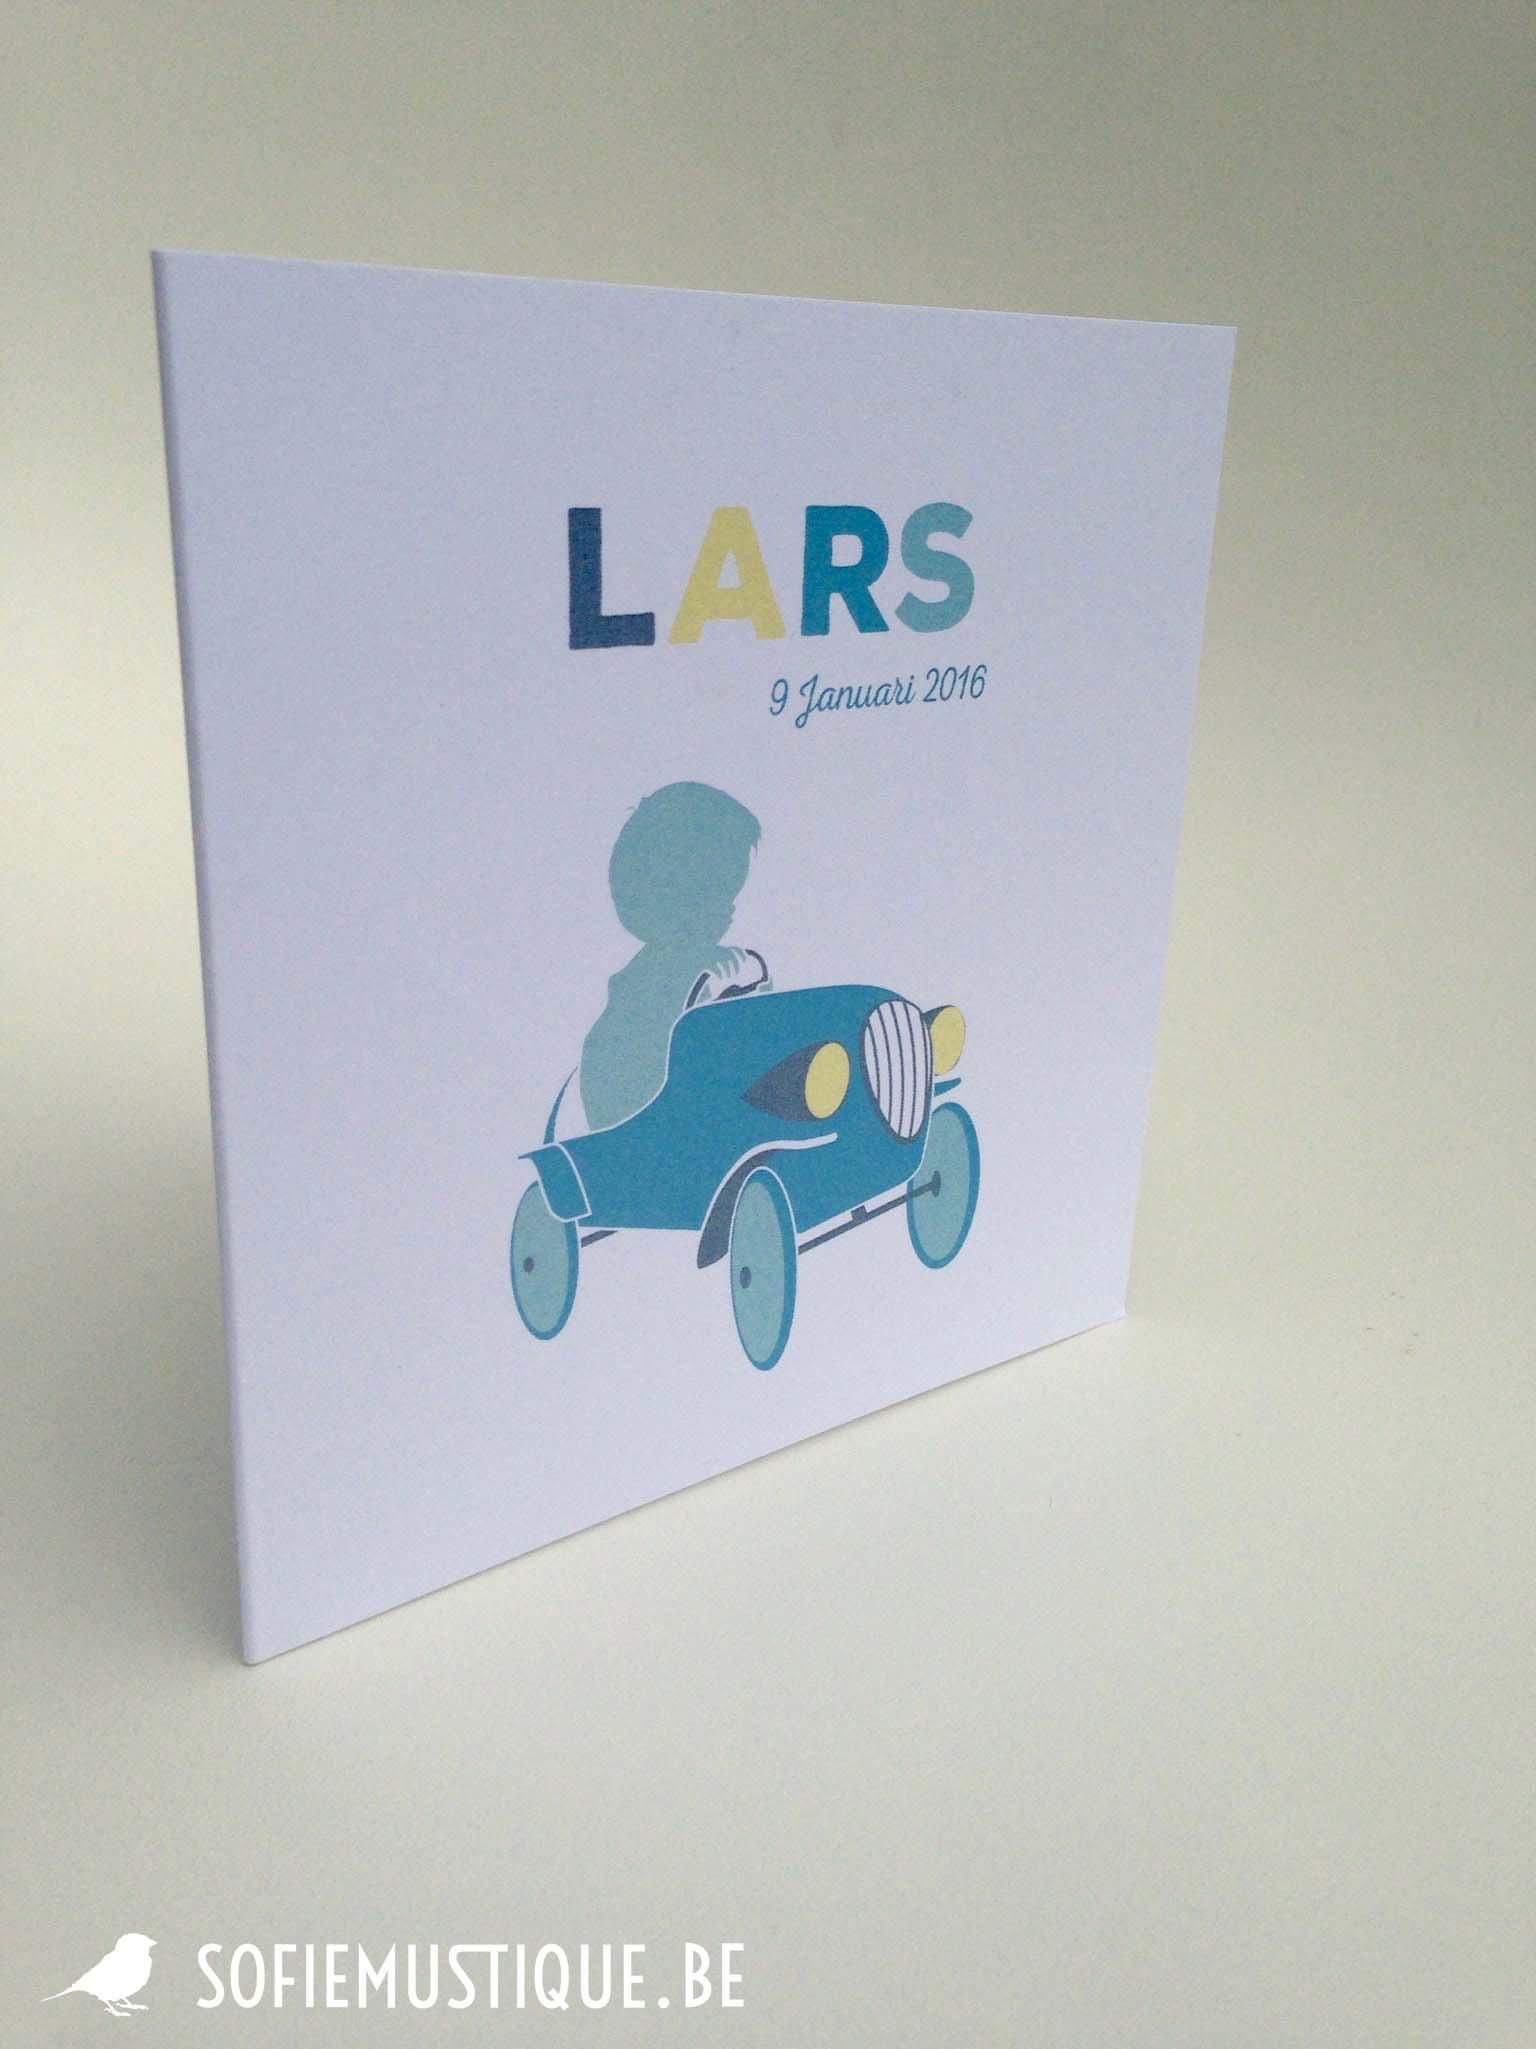 Geboortekaartje Lars | auto, vintage, blauw, silhouette, retro